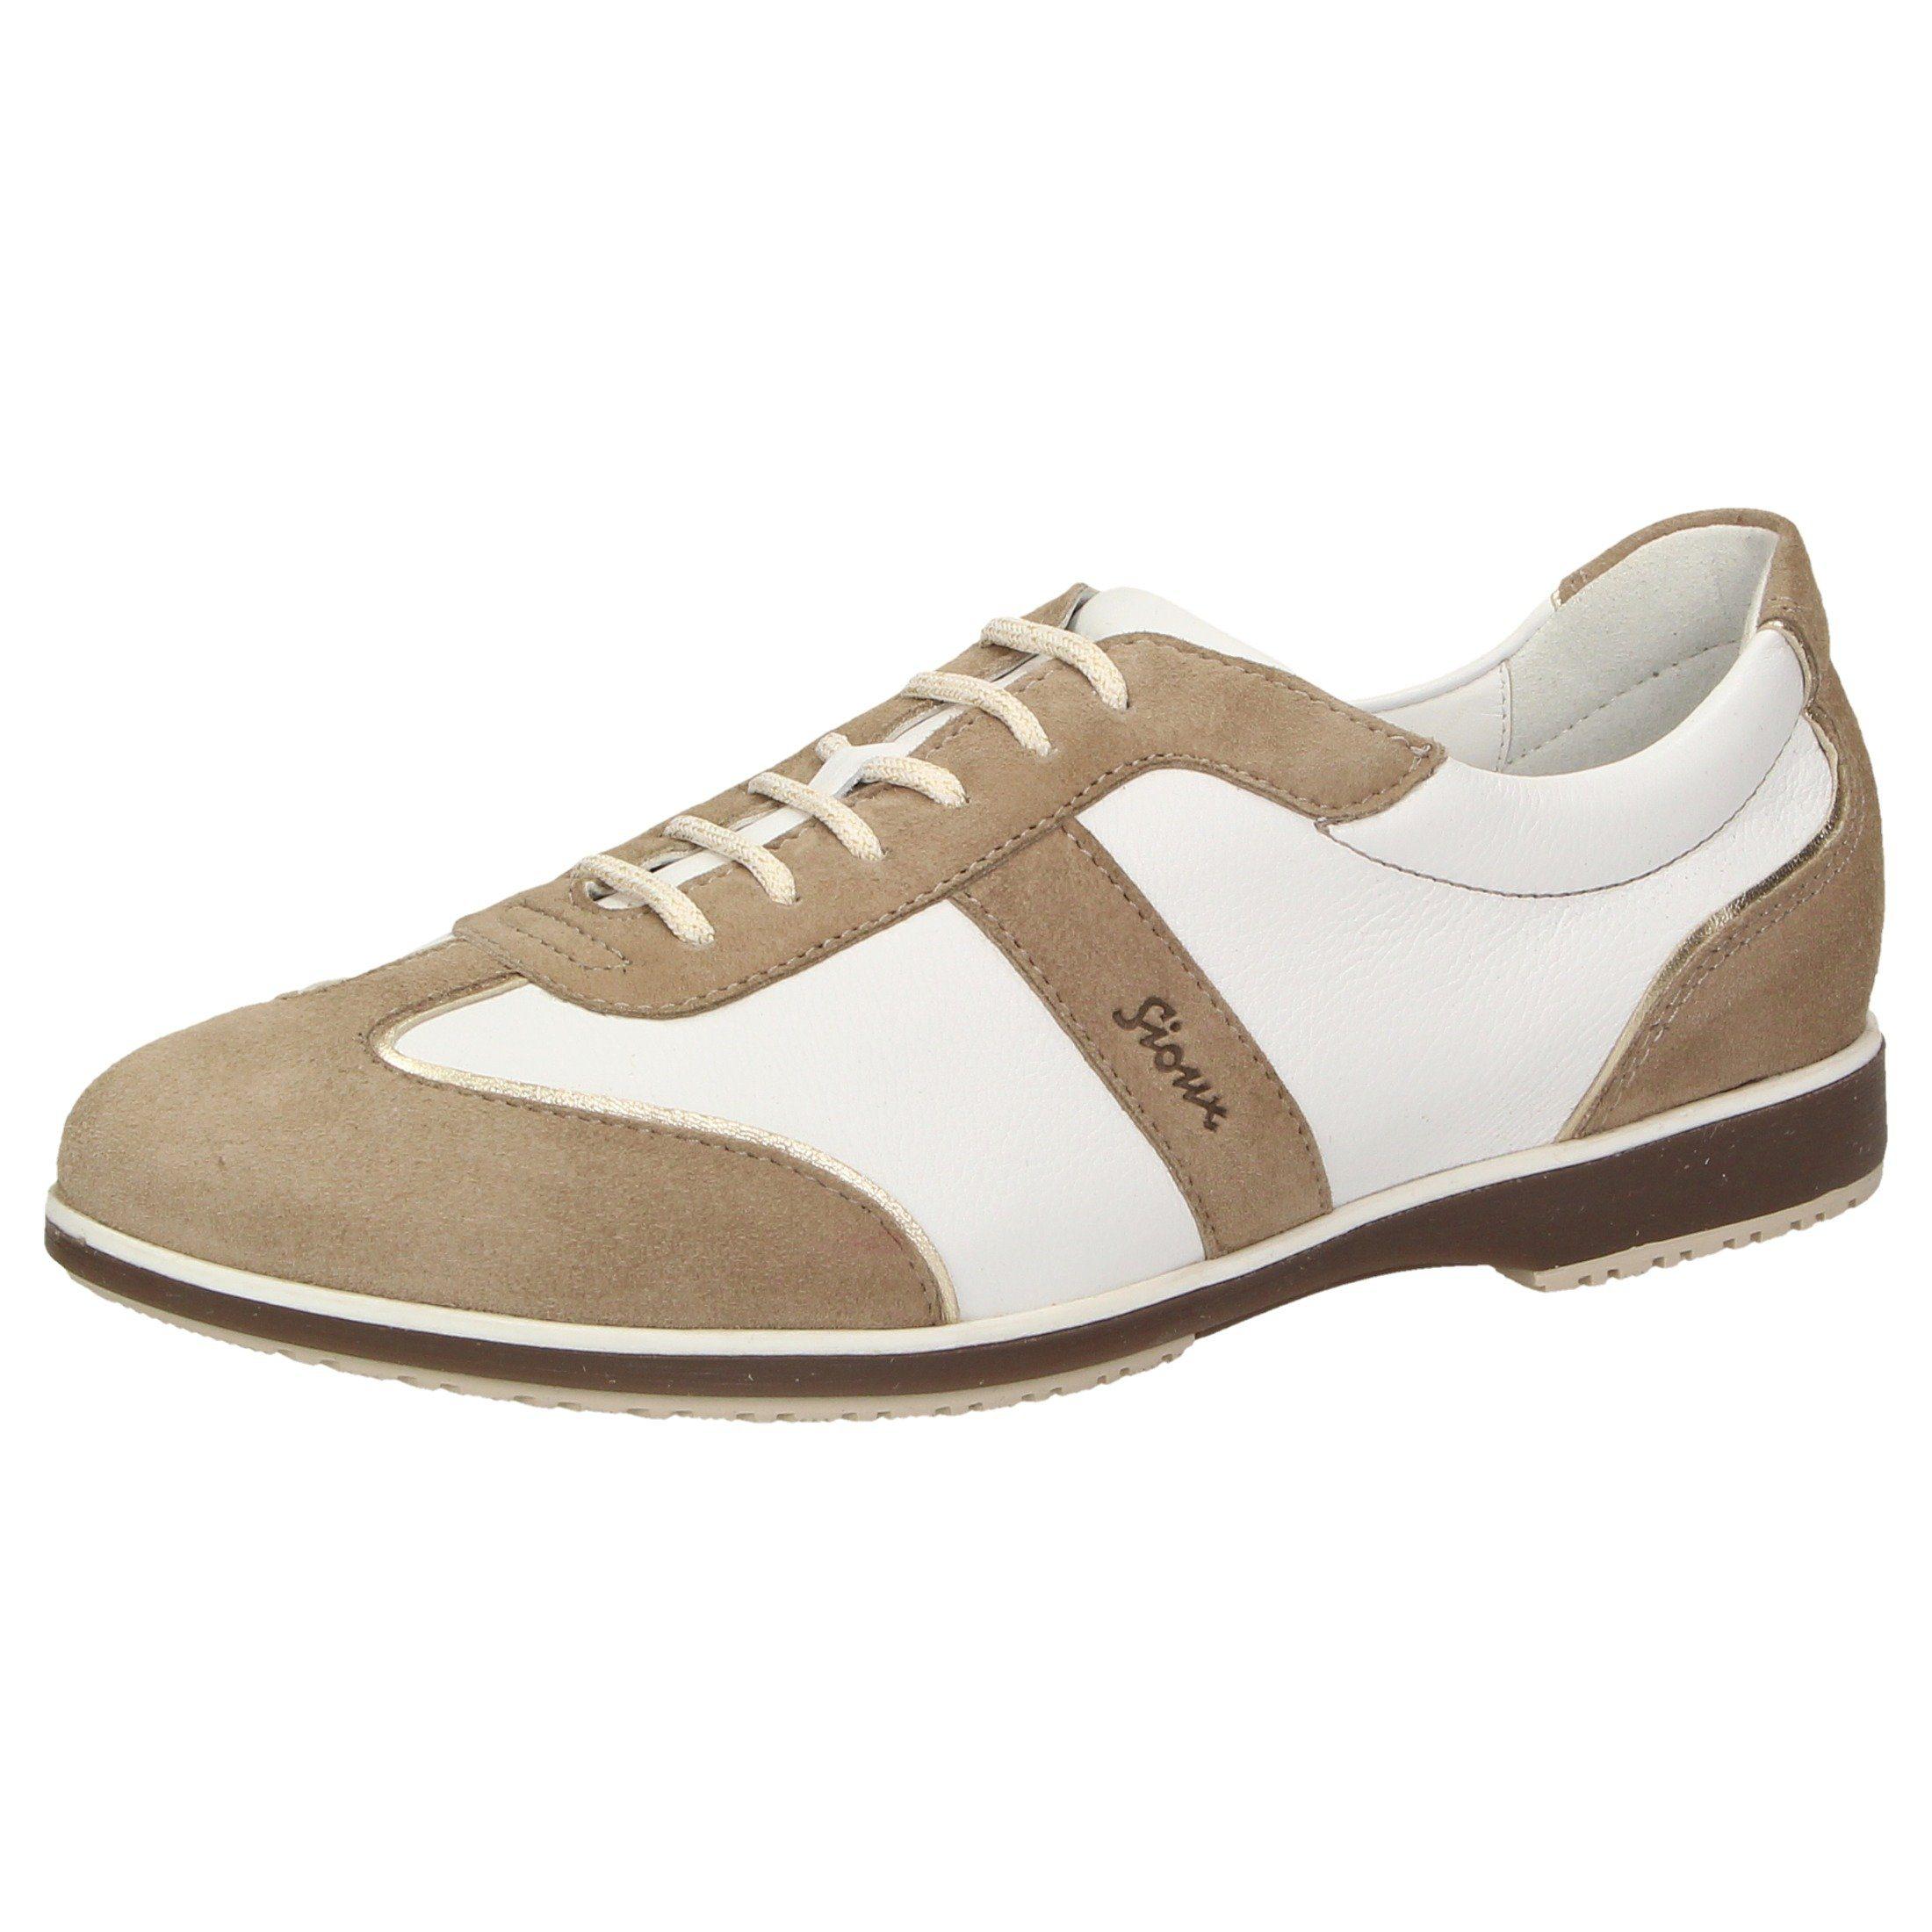 SIOUX Danutia Sneaker online kaufen  beige